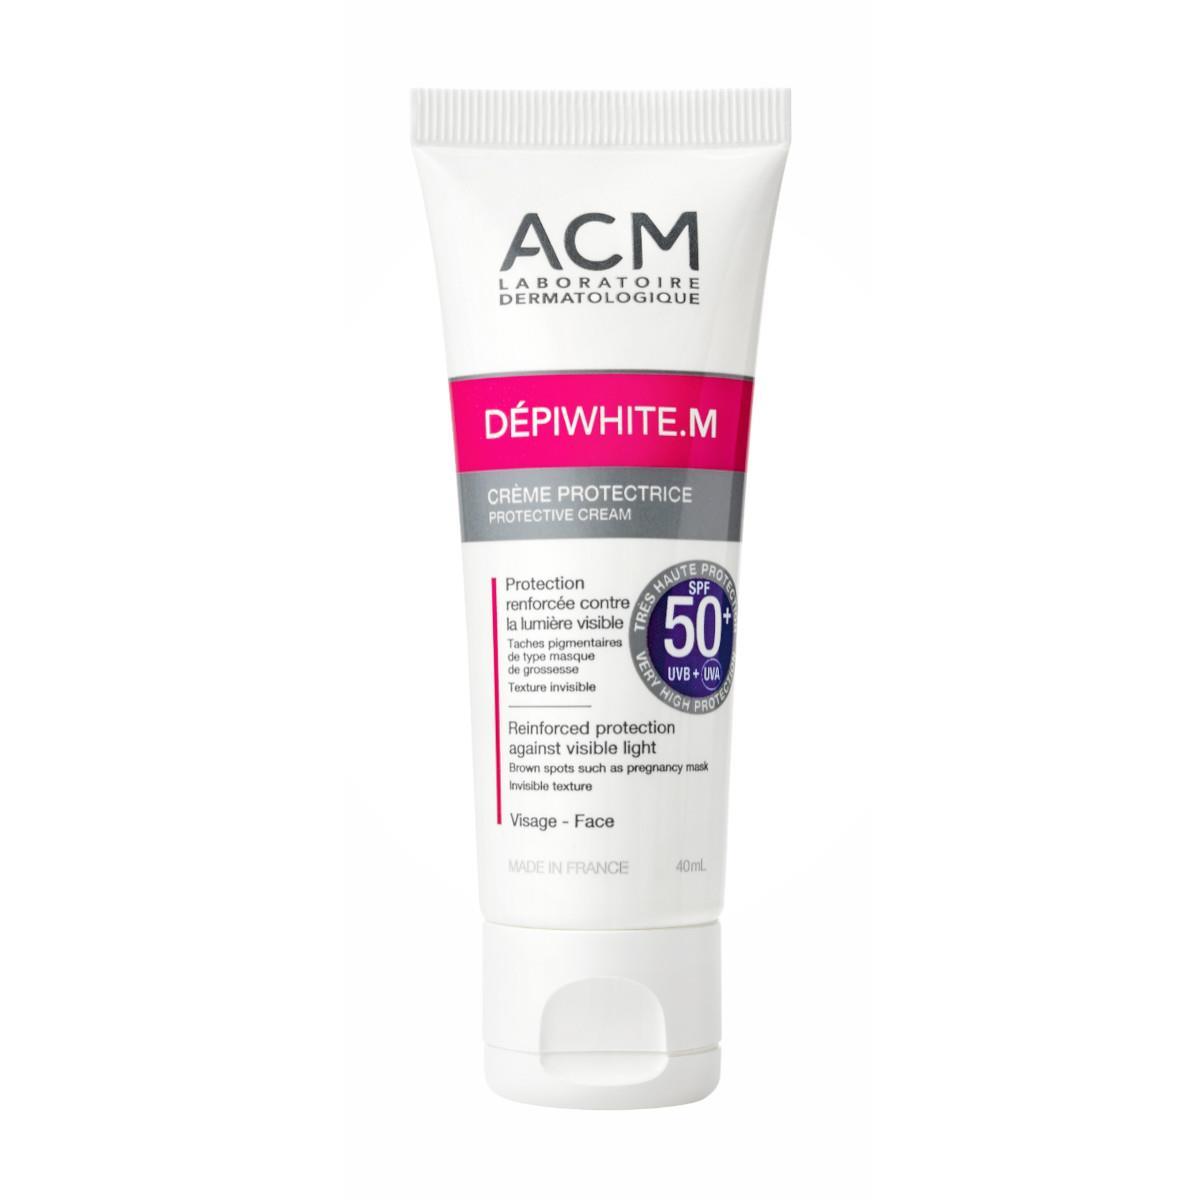 Depiwhite M Crema Protectora 40Ml.